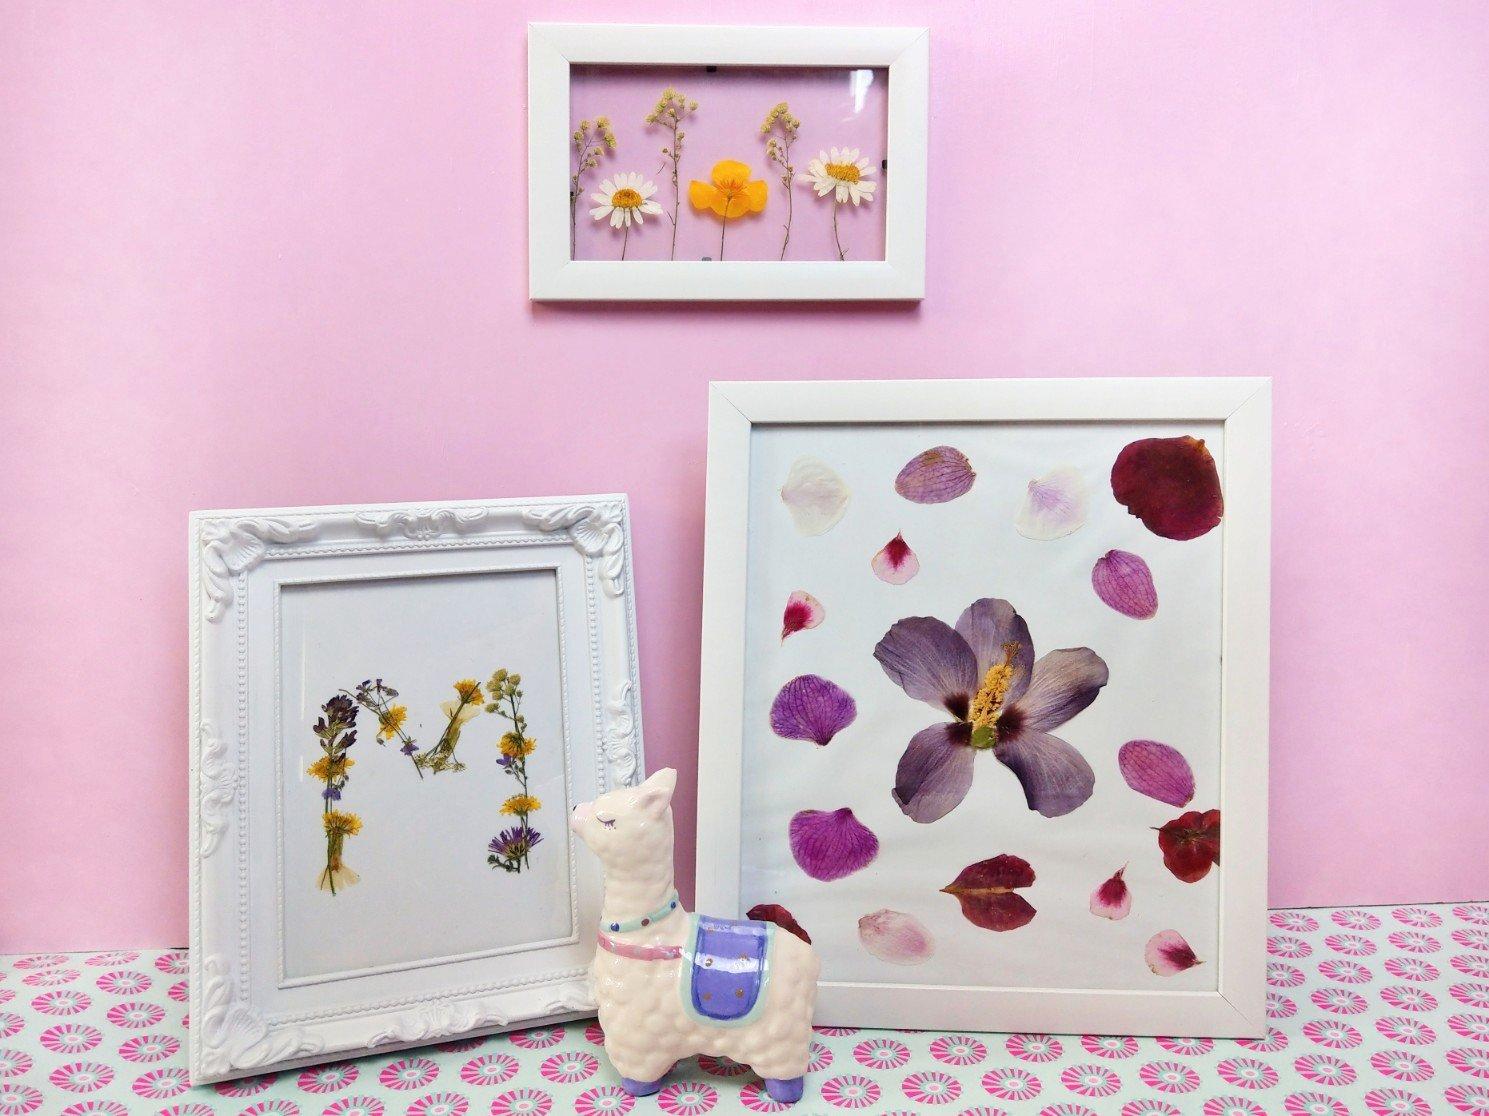 Drei tolle Ideen mit getrockneten Blumen – Deko im Bilderrahmen basteln